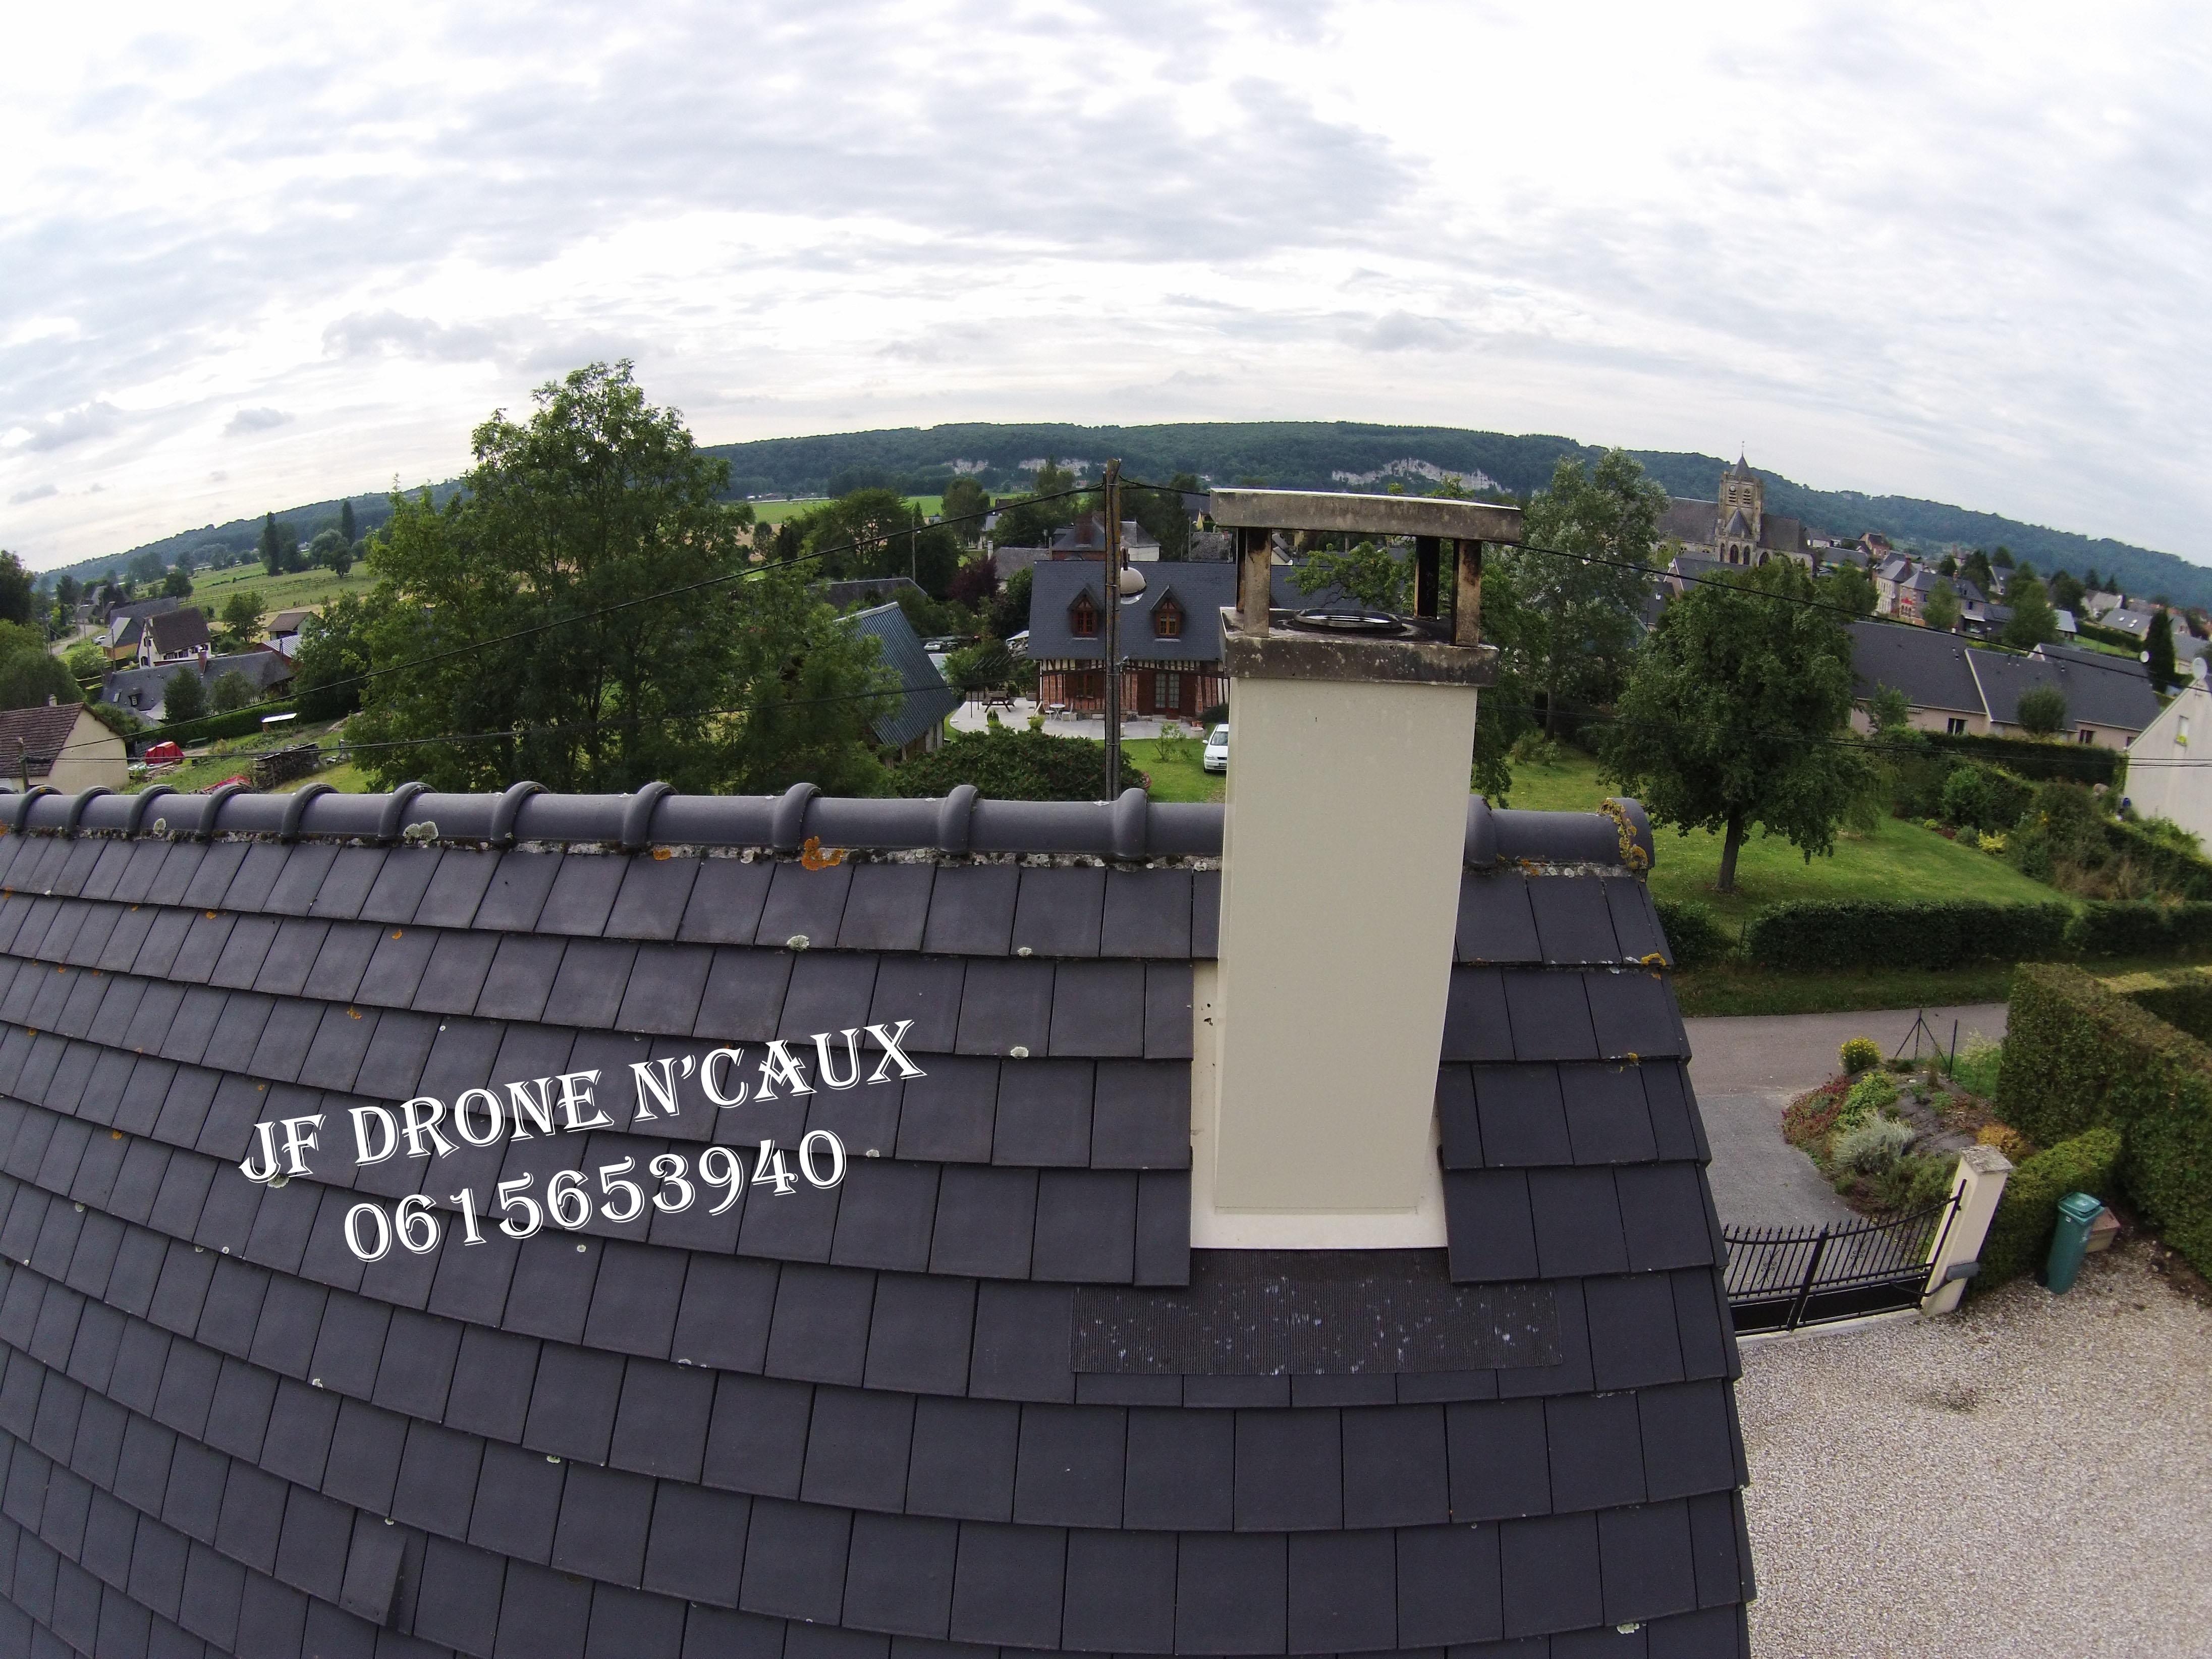 Cheminée JF DRONE N'CAUX